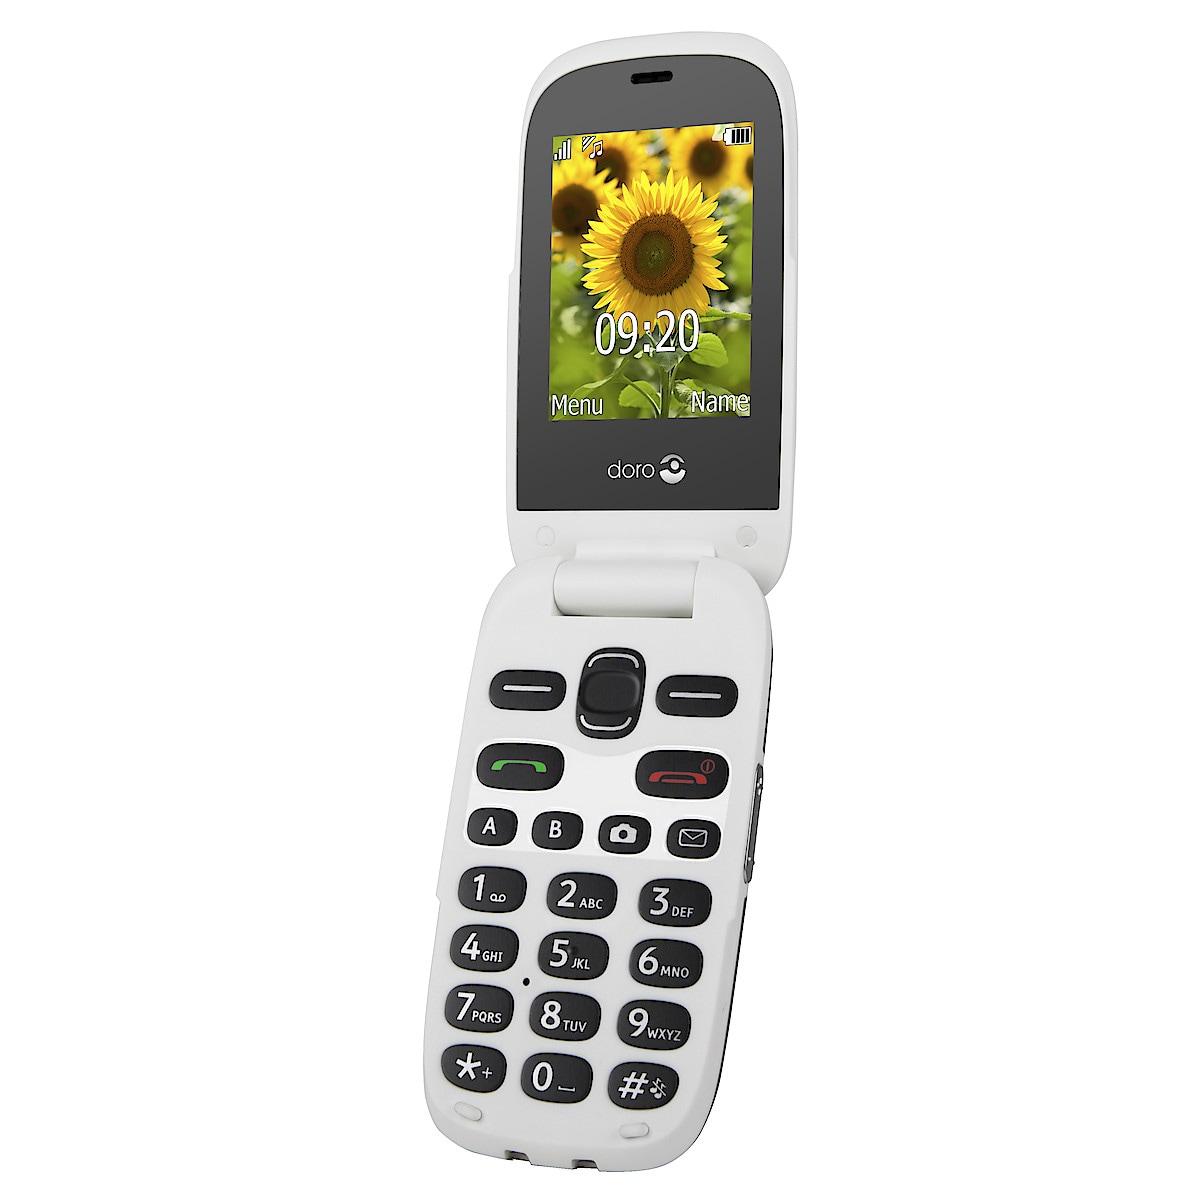 Doro 6031 mobiltelefon | Clas Ohlson